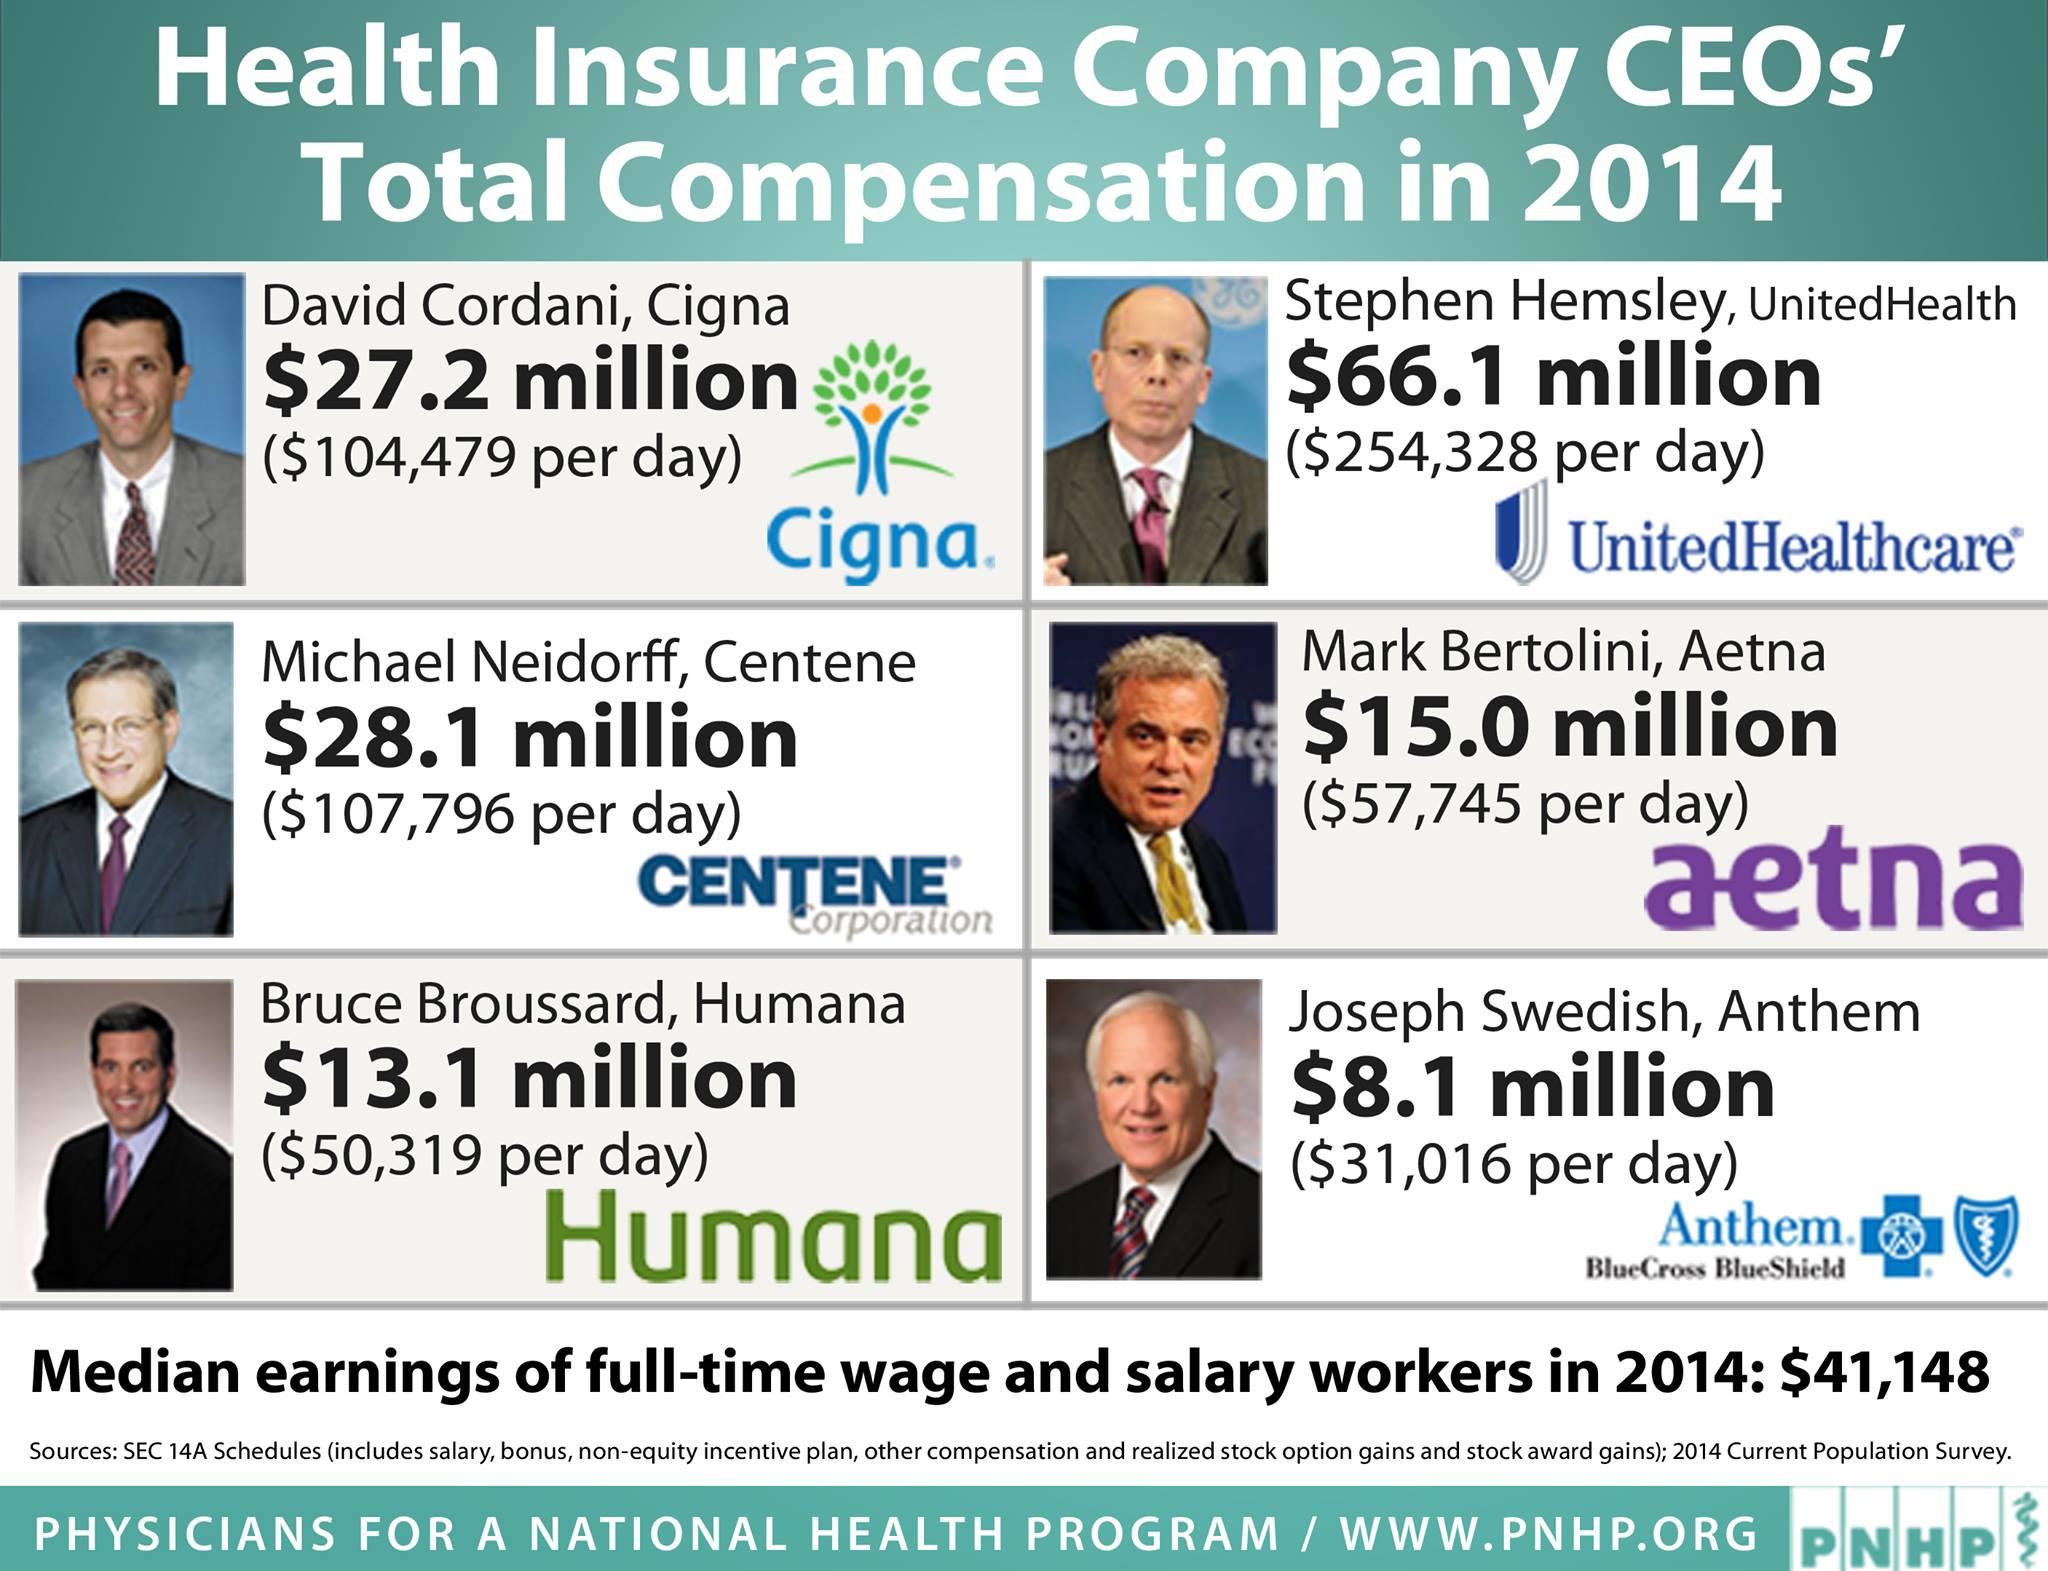 health insurance ceo salaries